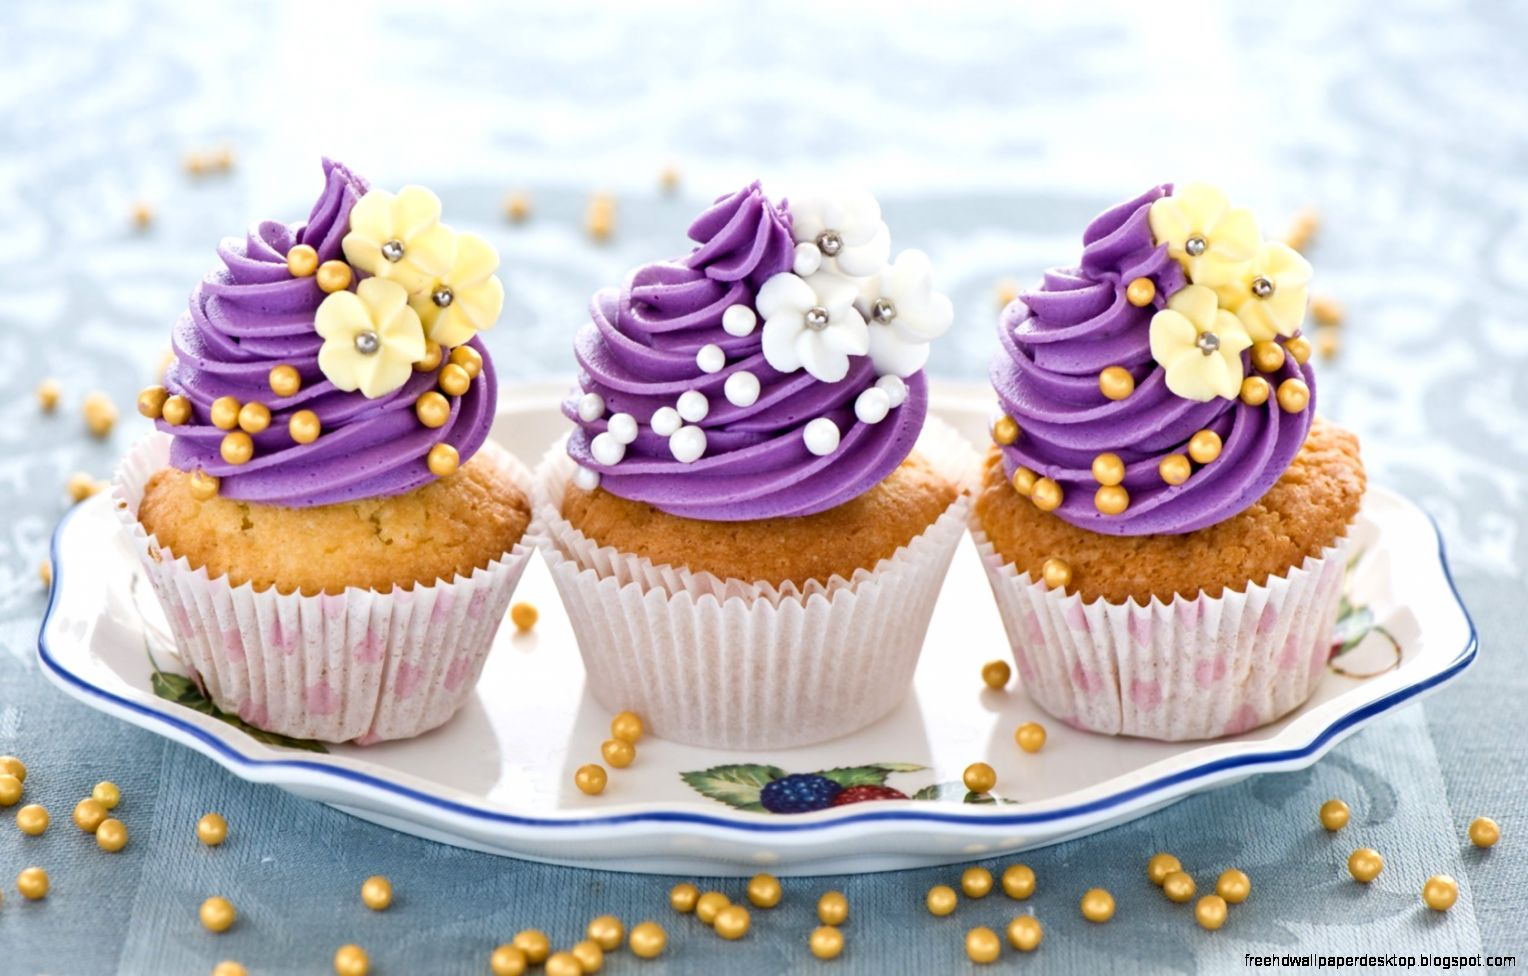 sweets dessert cupcake photo hd wallpaper | free high definition